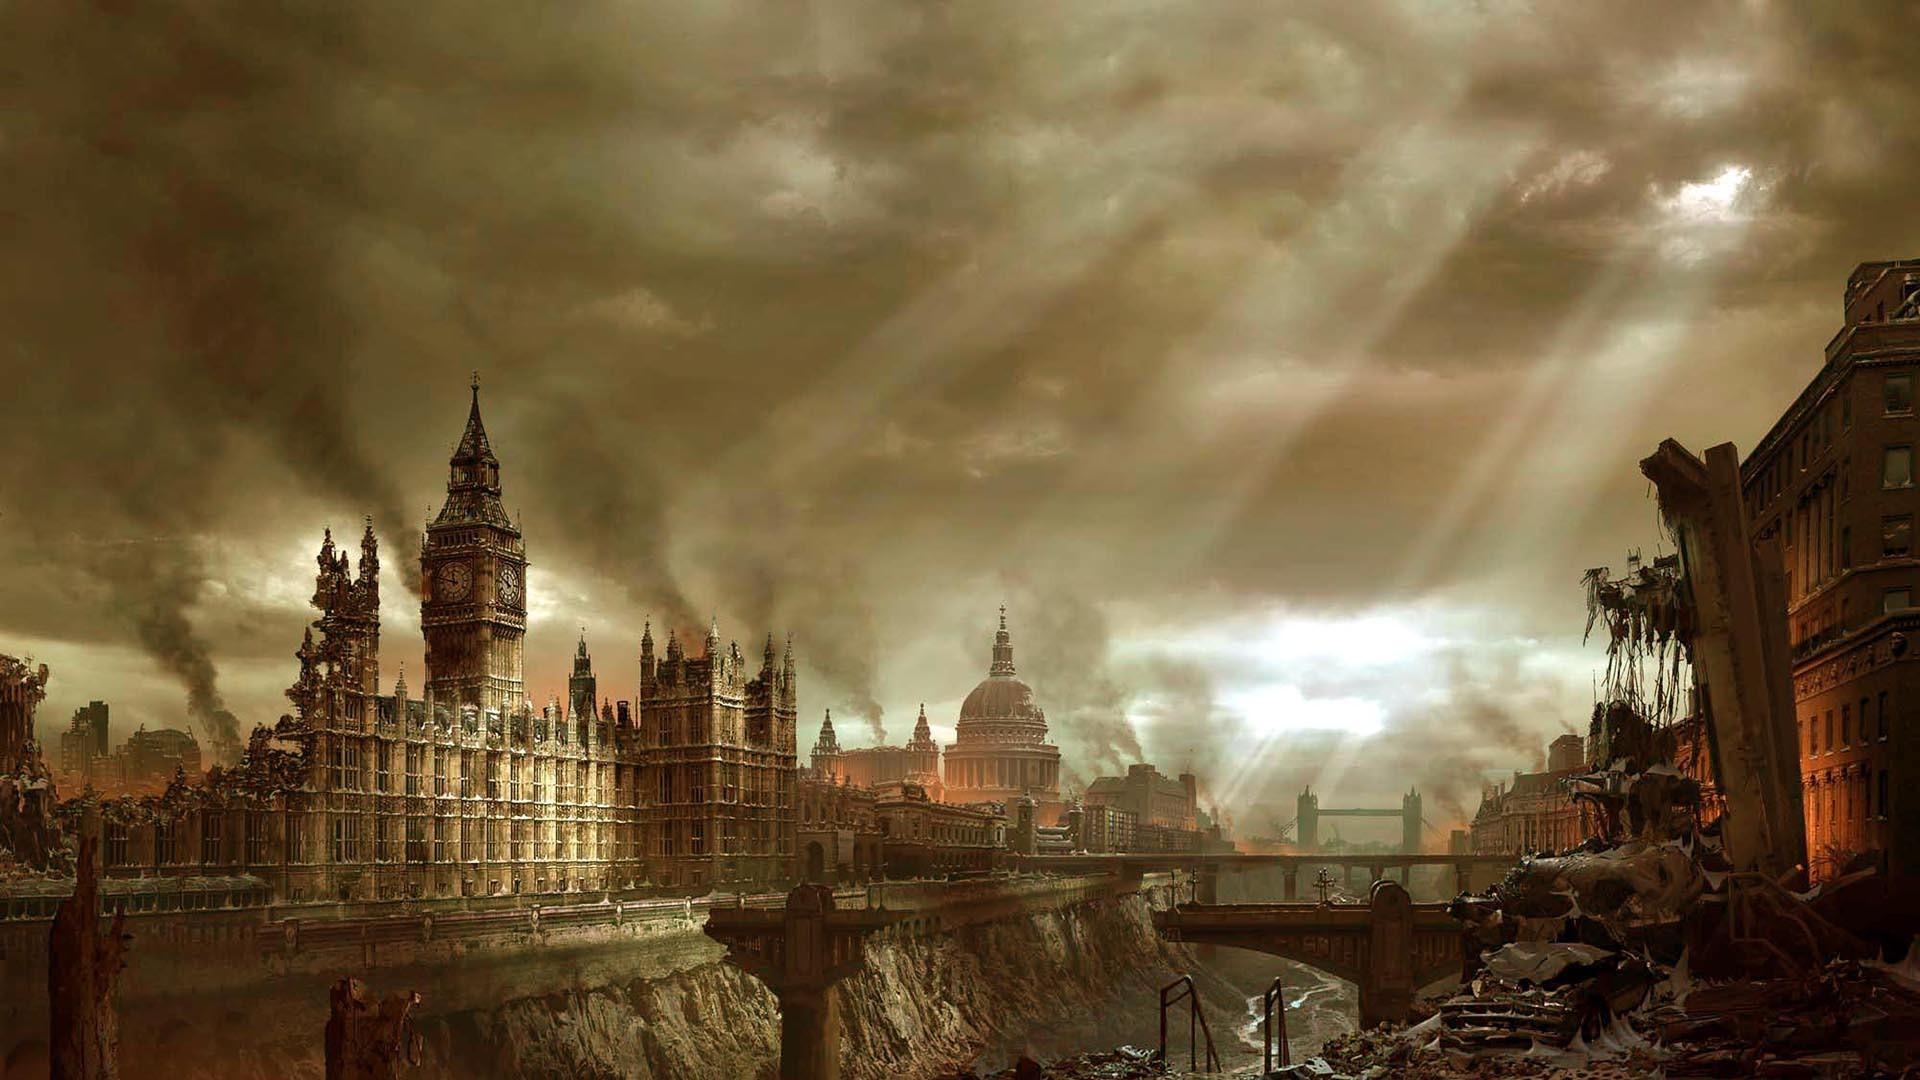 apocalyptic, City, Building, Ruin, Sun rays, London Wallpaper